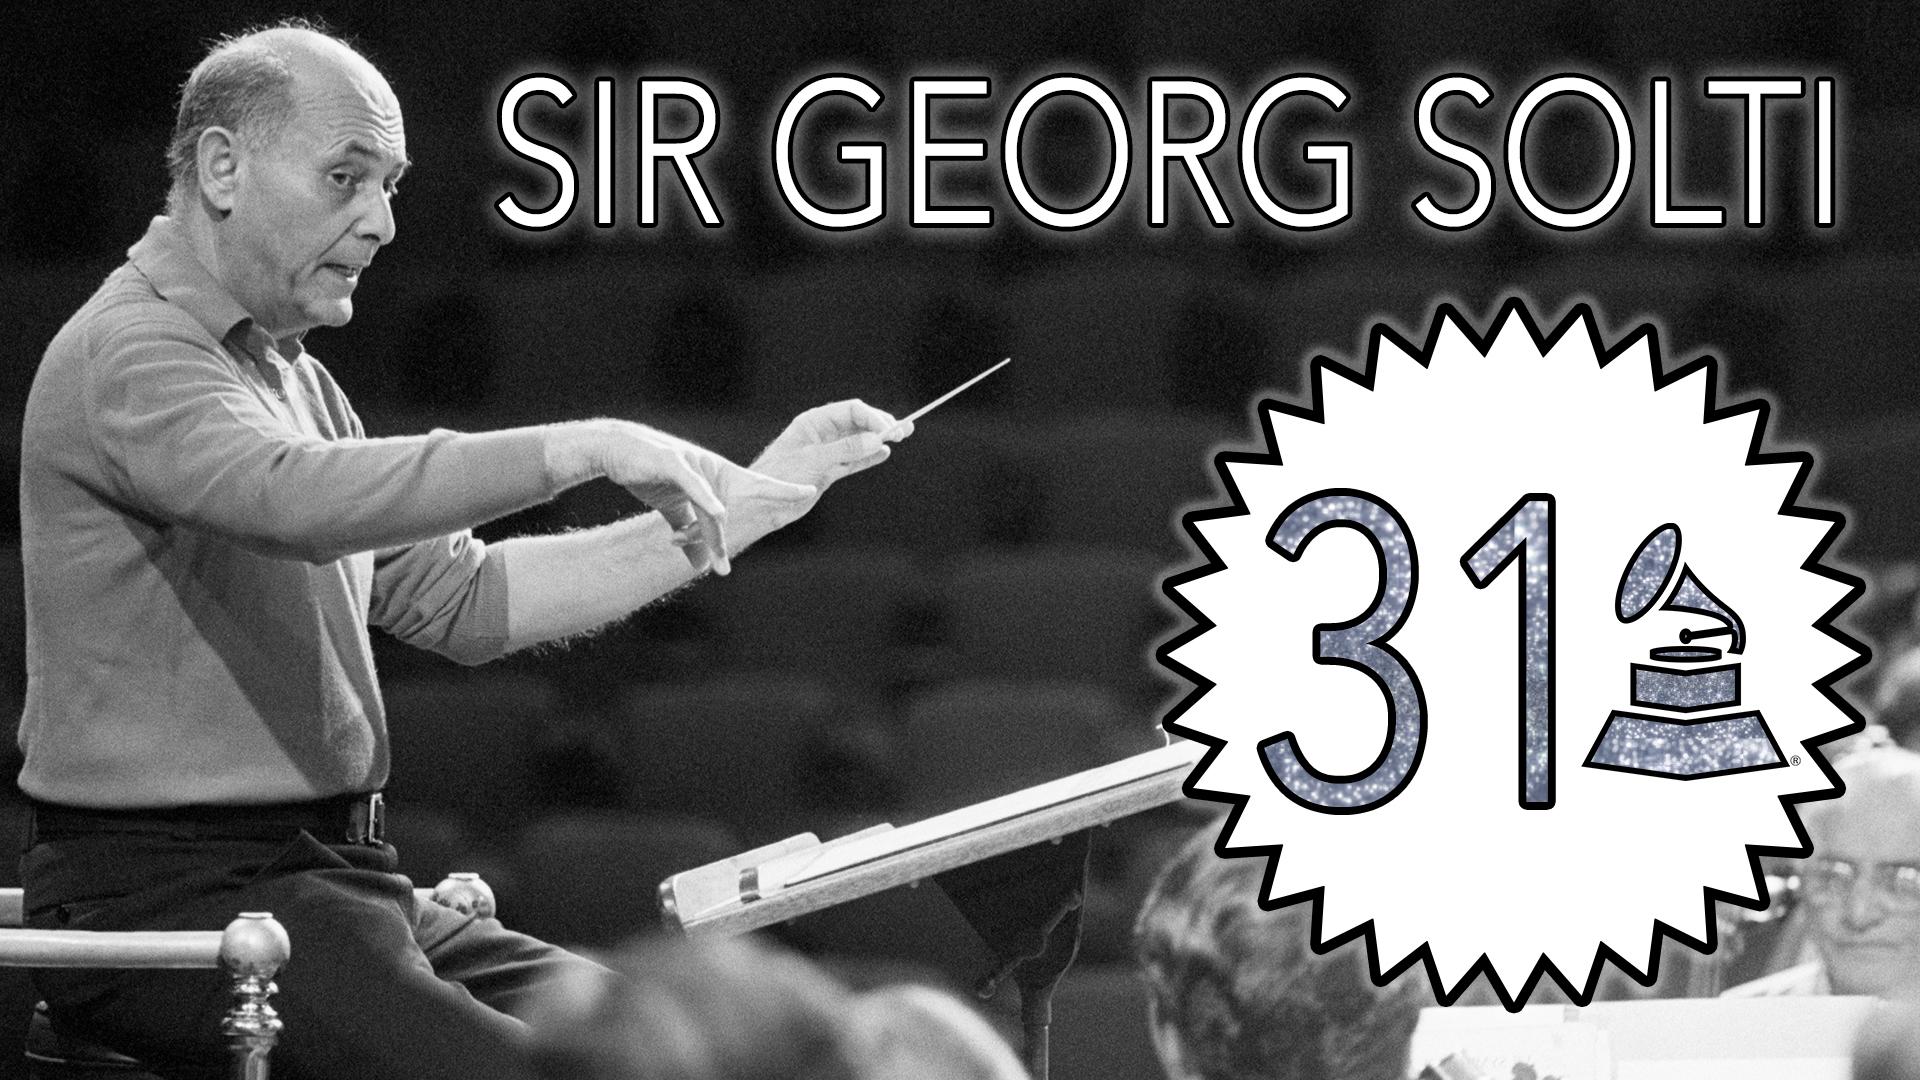 Sir Georg Solti with 31 GRAMMY Awards